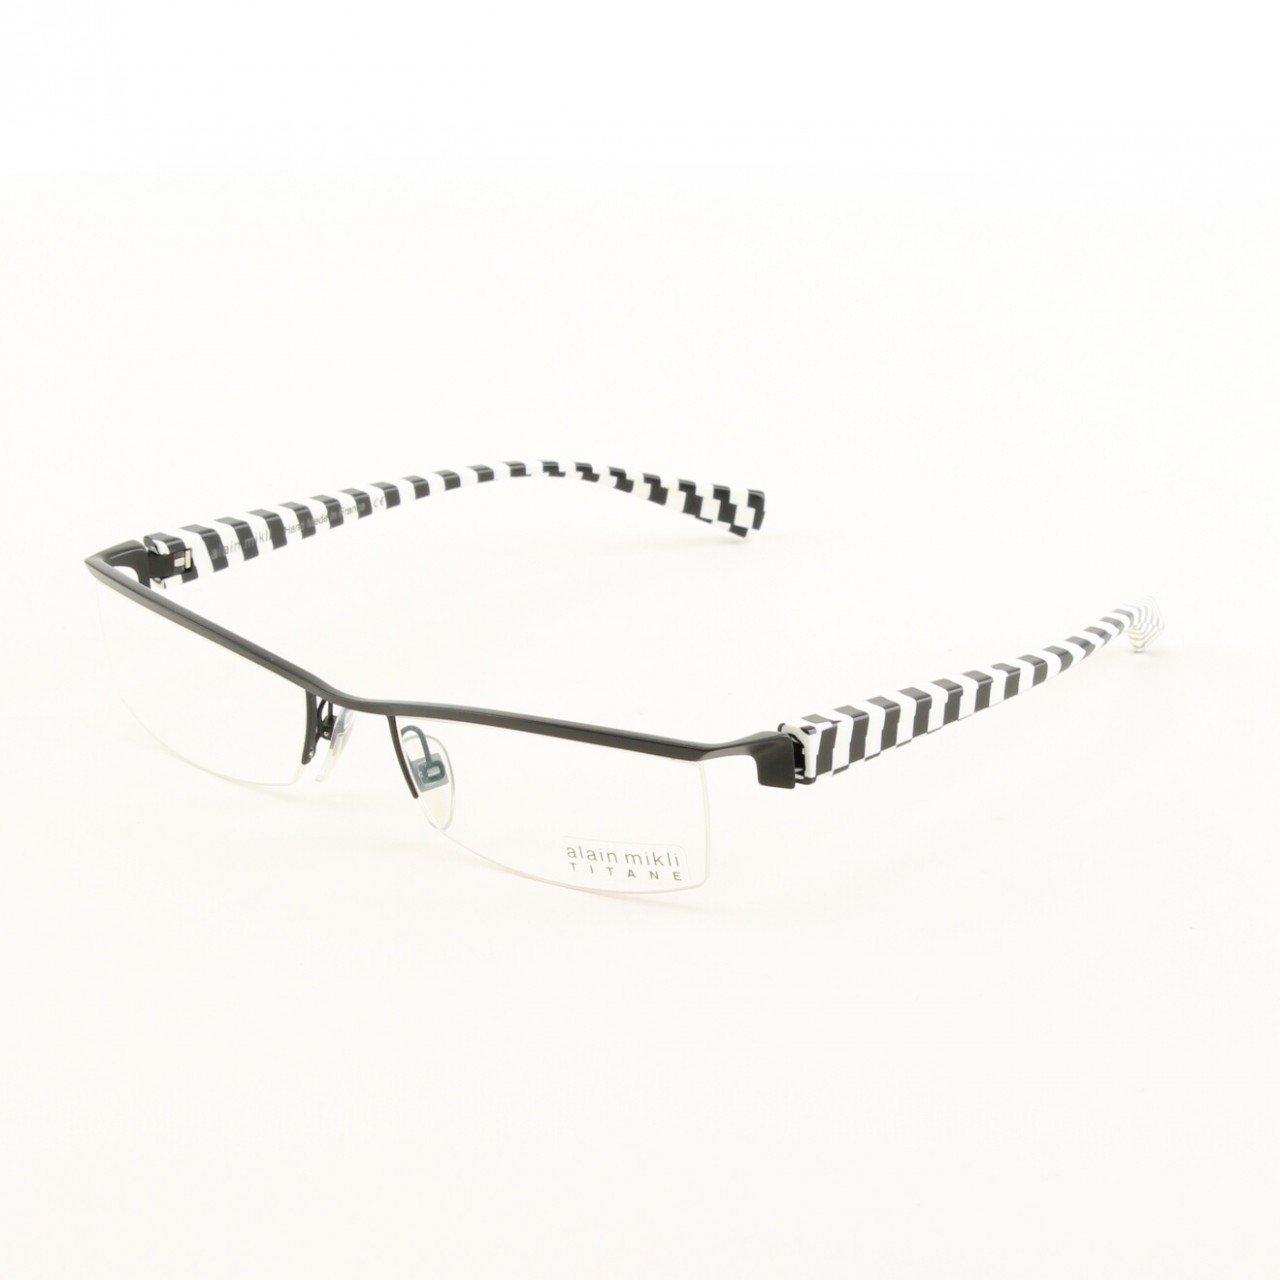 Alain Mikli Eyeglasses AL0523 Col. 11 Black Metal Frame with Black and White Checkerboard Temples